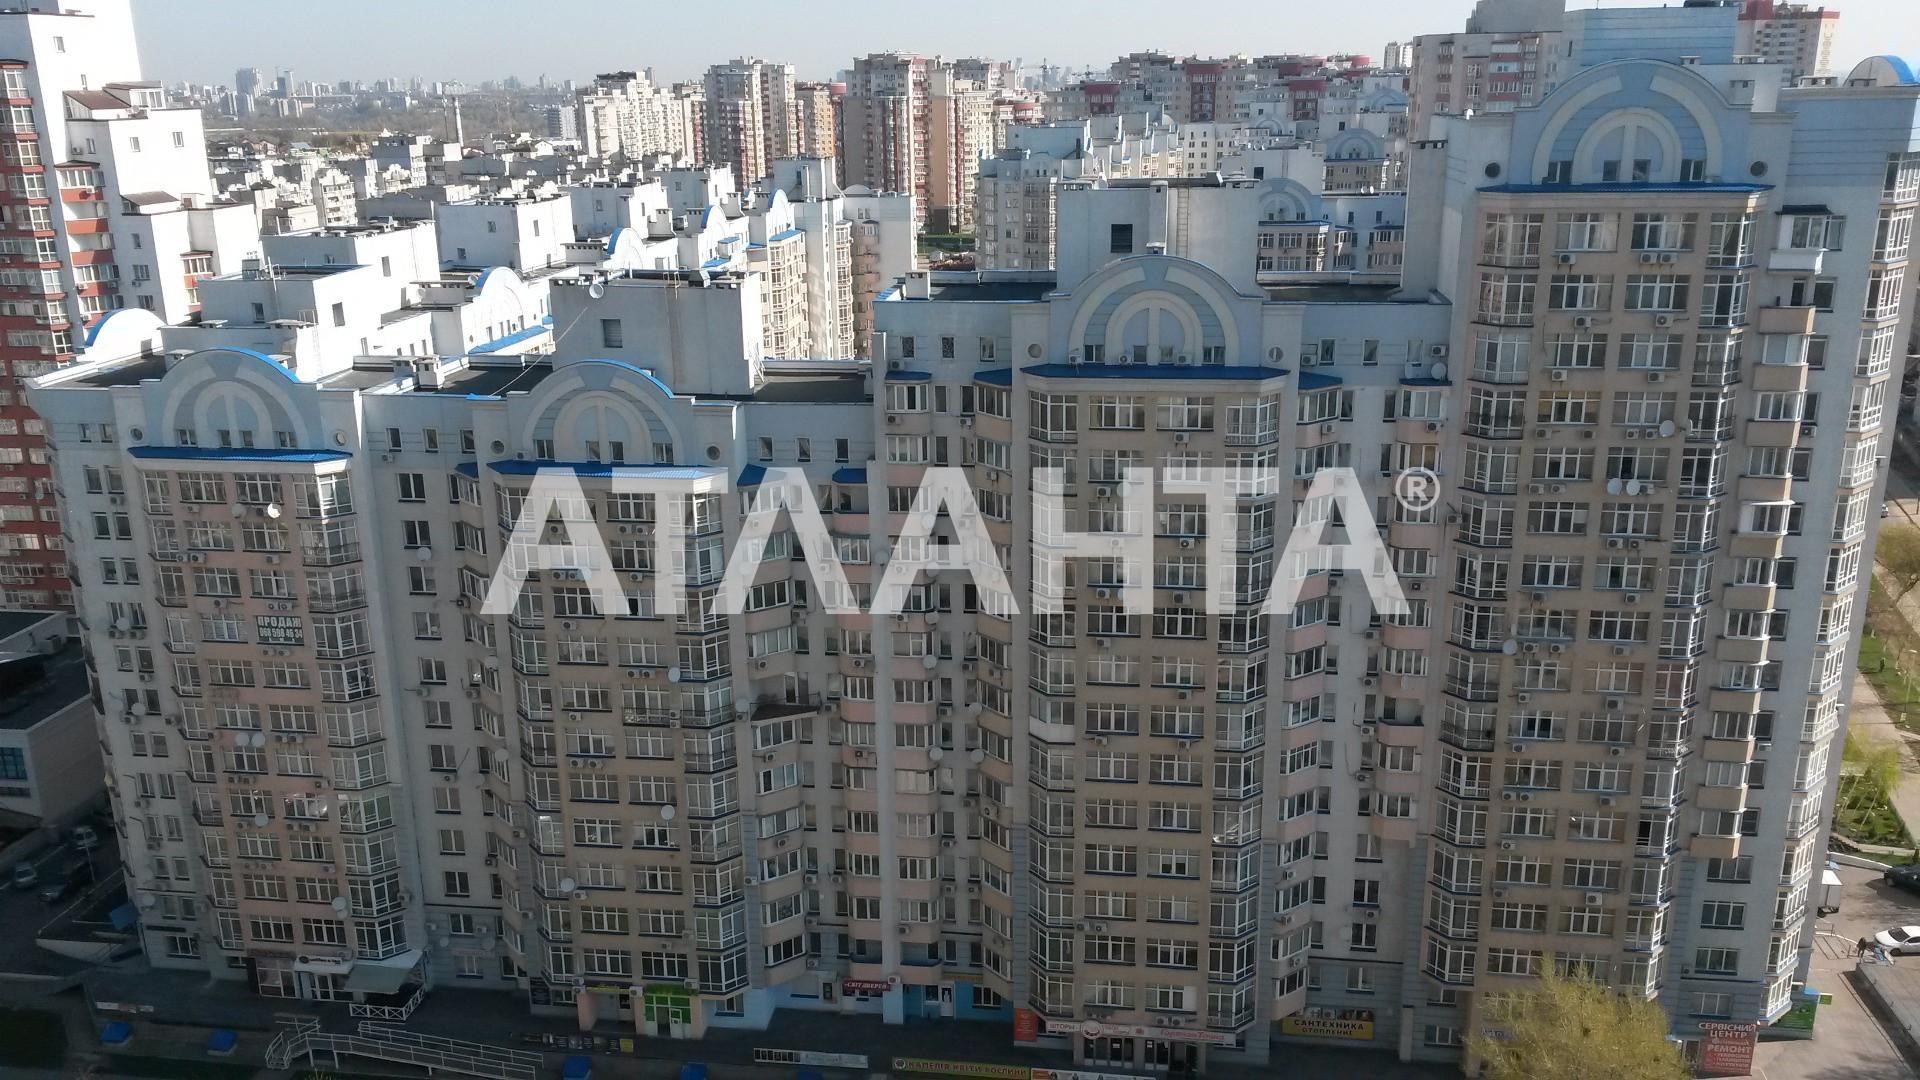 Продается 3-комнатная Квартира на ул. Ломоносова — 111 000 у.е. (фото №14)